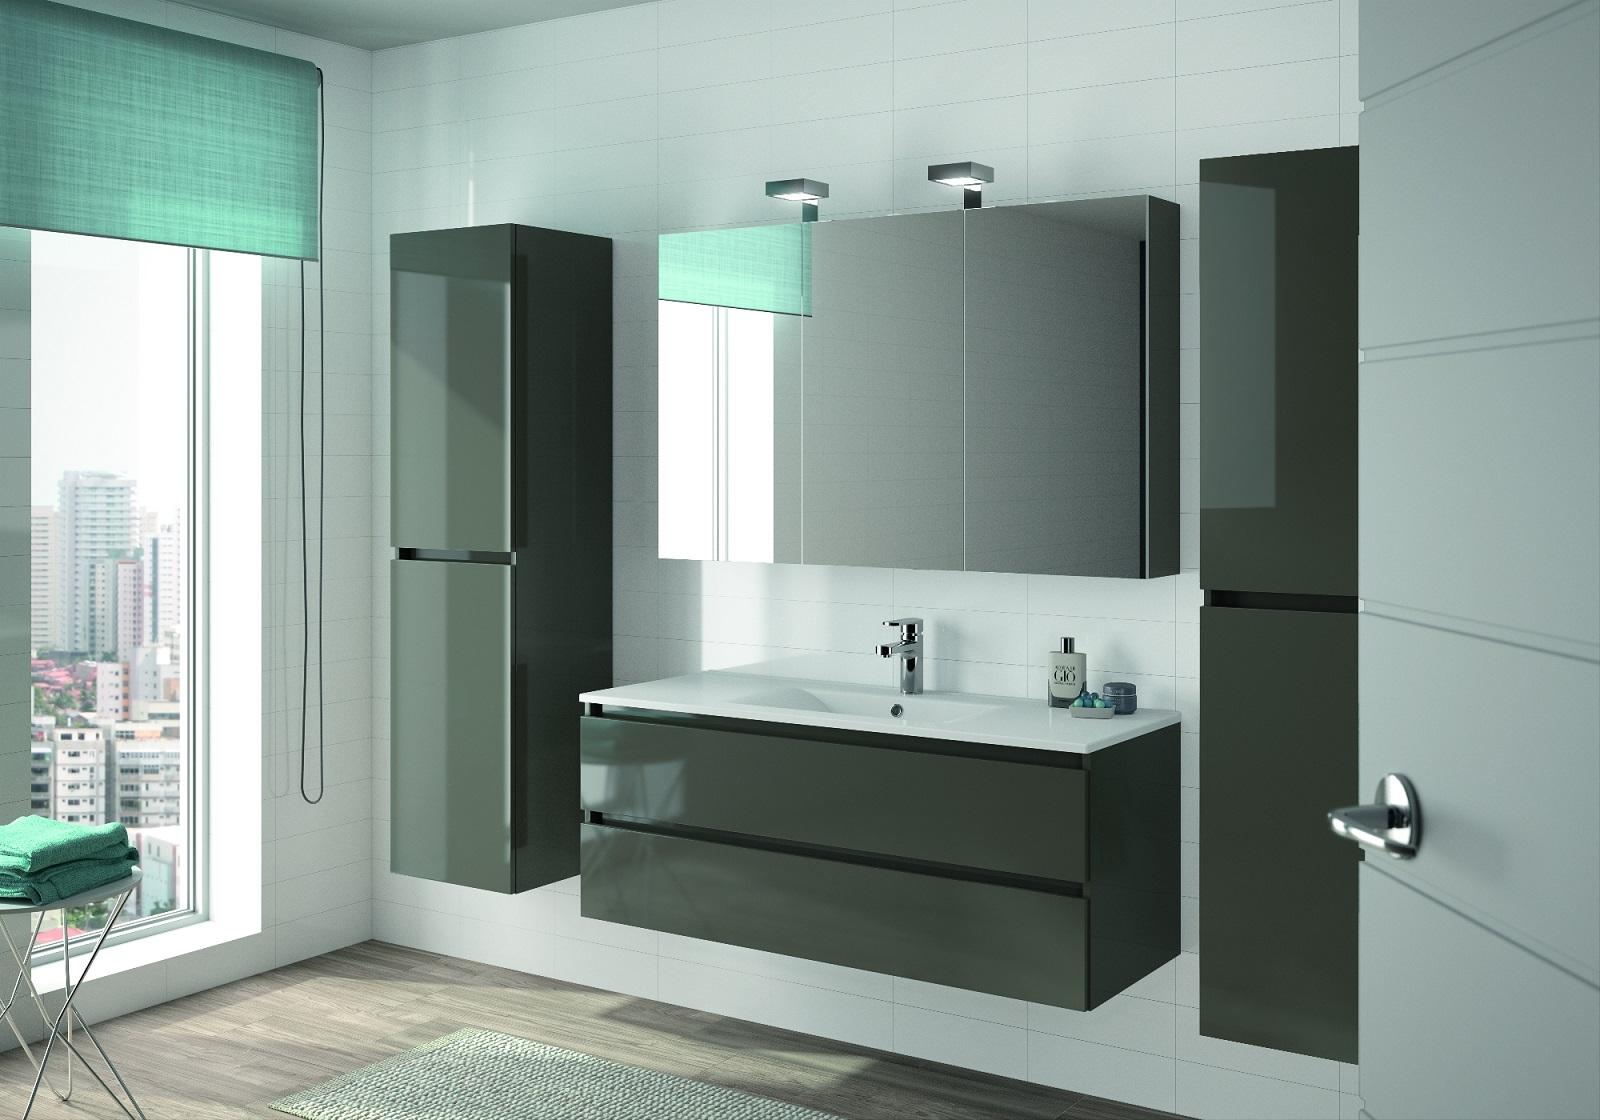 allibert badm bel badm belset vormontiert grau glanz spiegel waschtisch 120 cm ebay. Black Bedroom Furniture Sets. Home Design Ideas